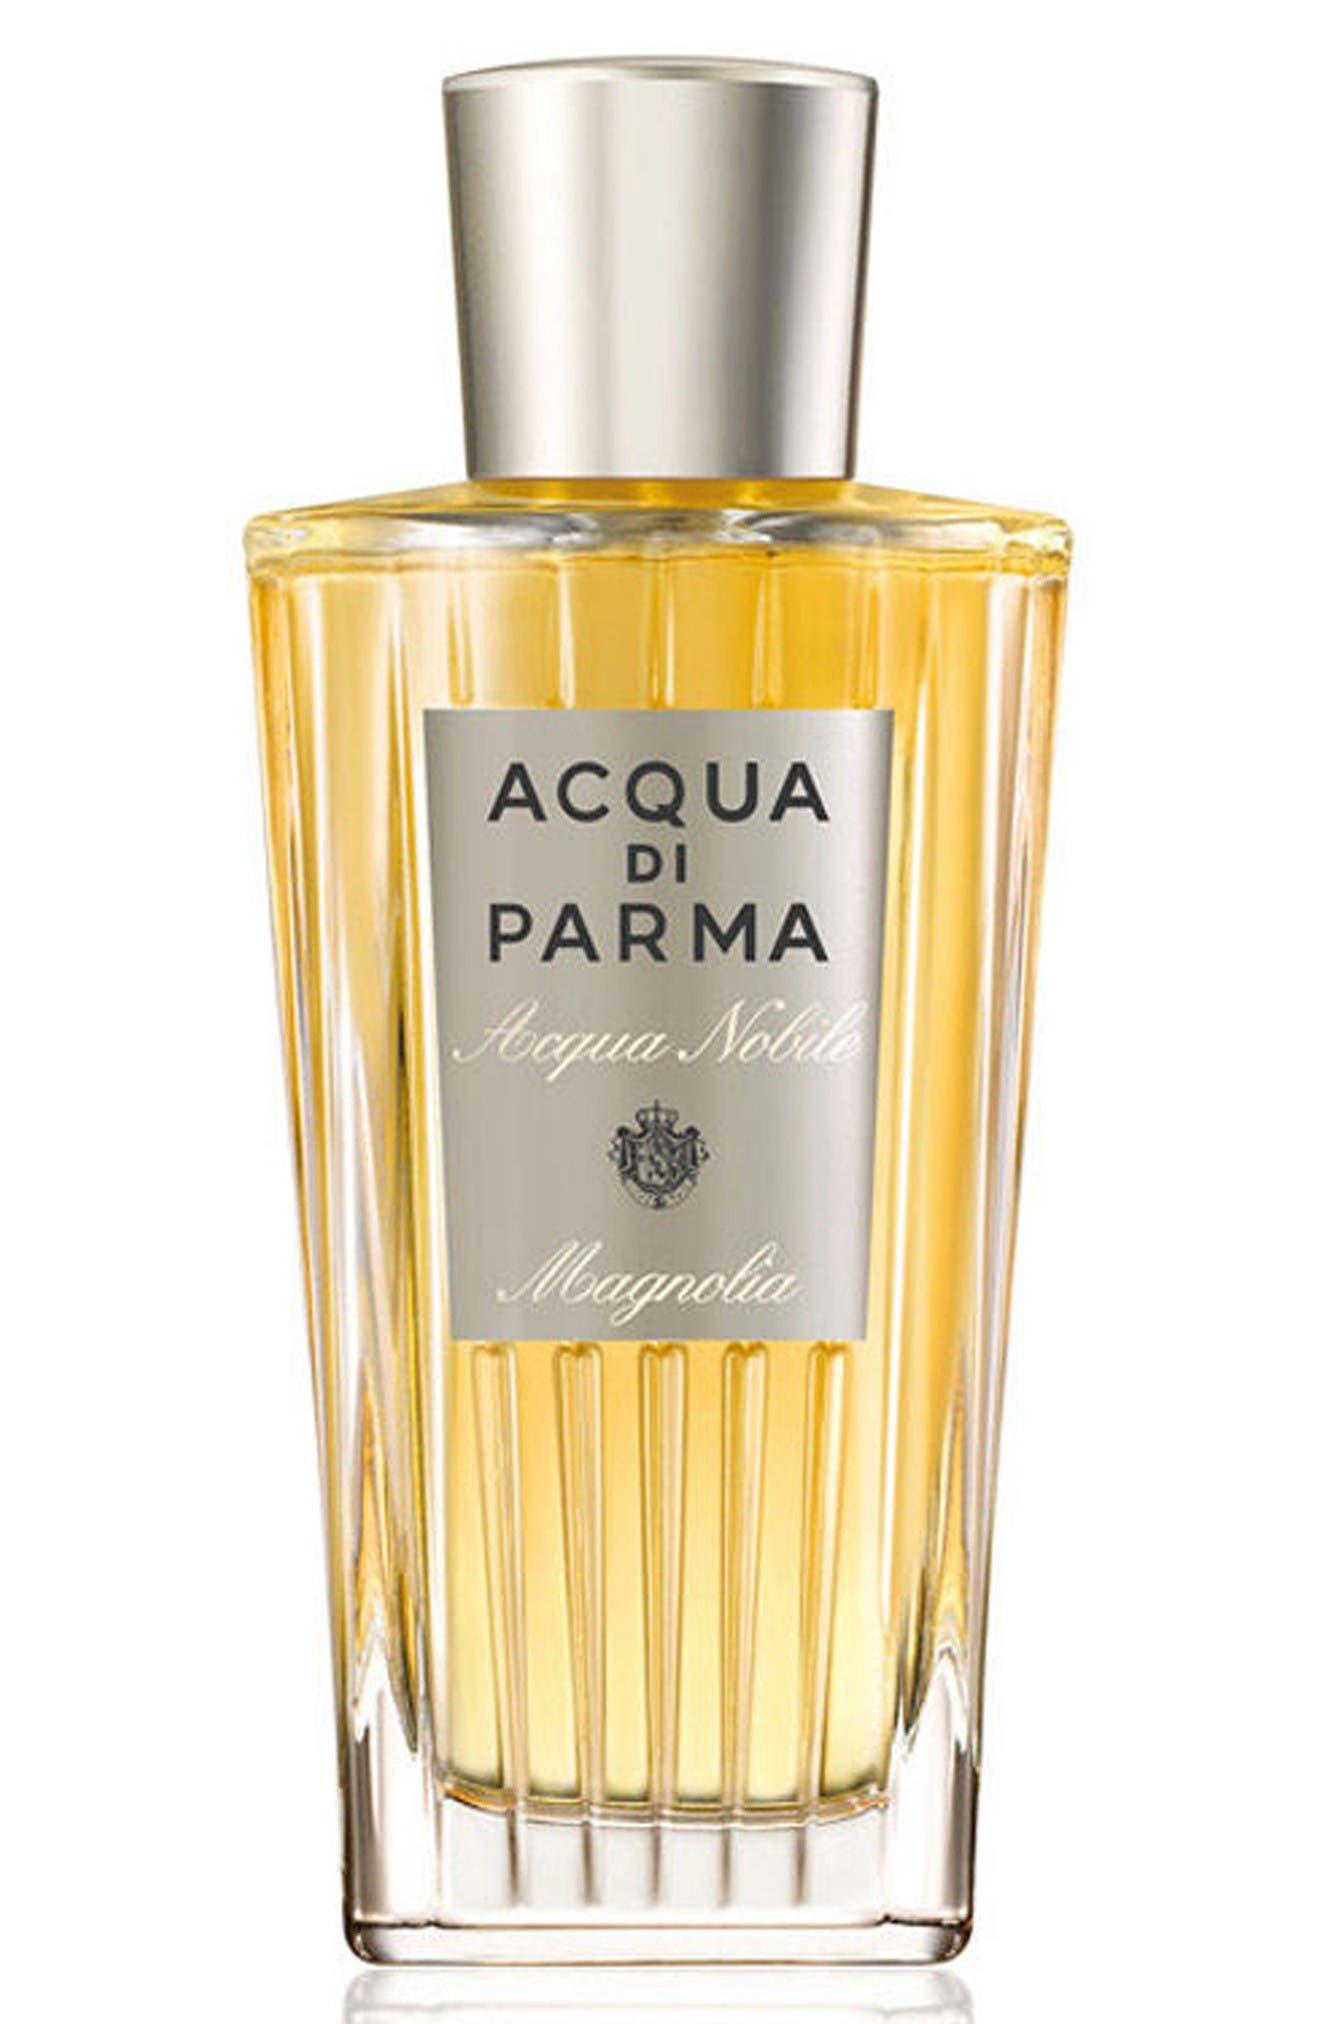 ACQUA DI PARMA Acqua Nobili Magnolia Fragrance